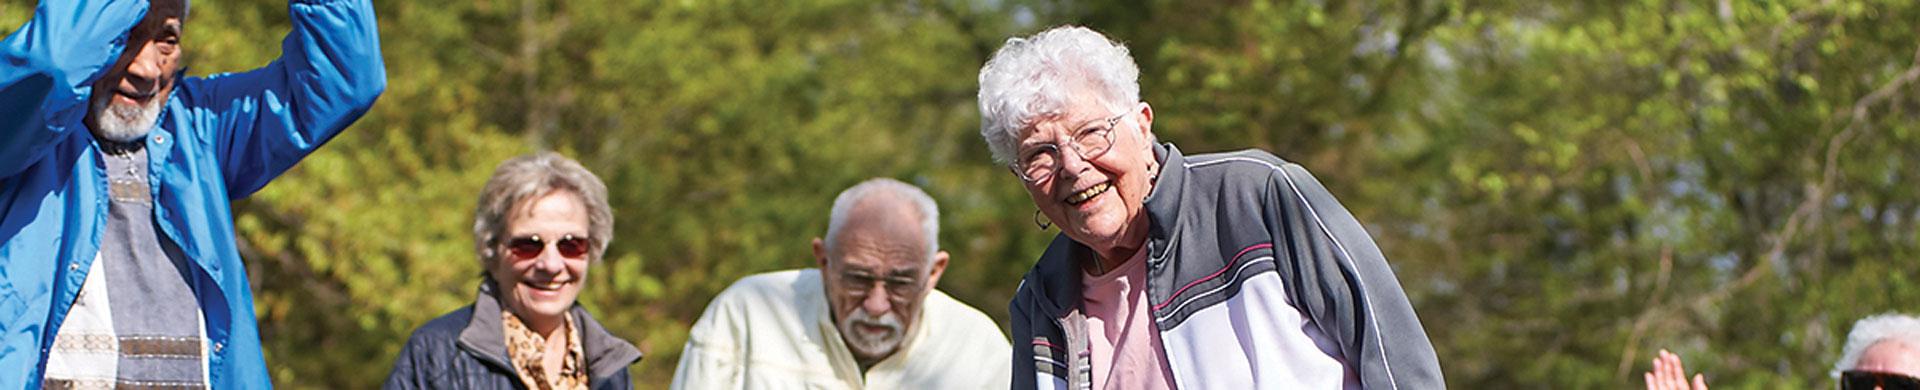 Independent Living in Bridgewater NJ Laurel Circle Retirement Community